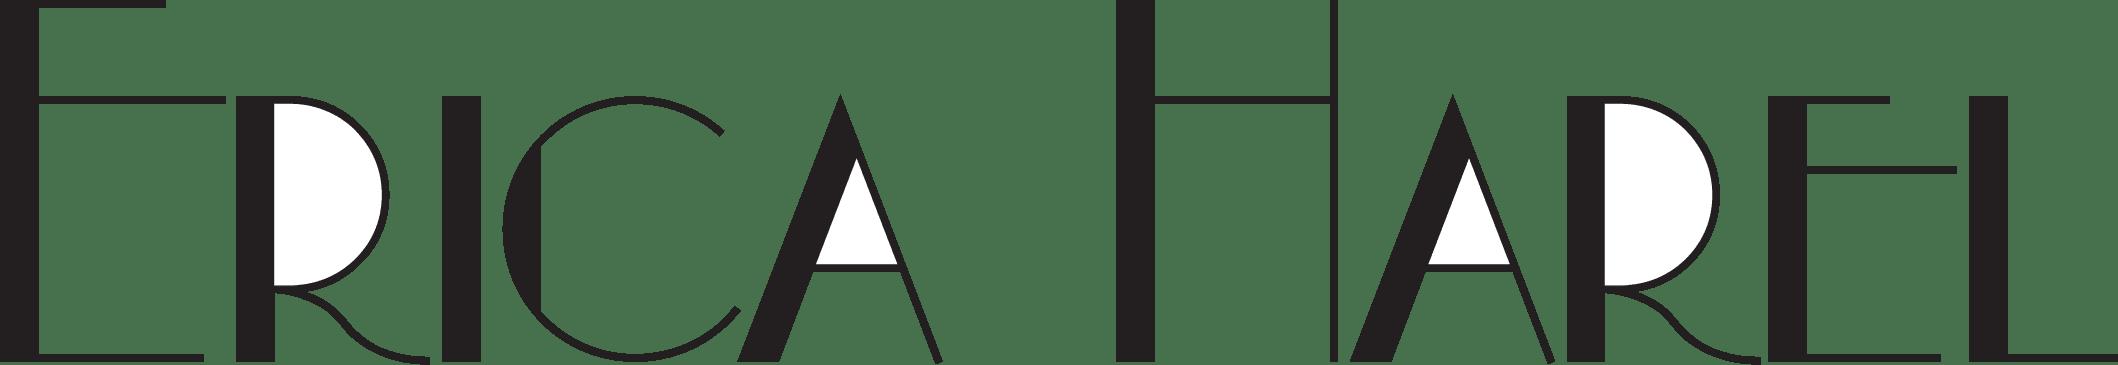 New-Erica-Harel-Logo